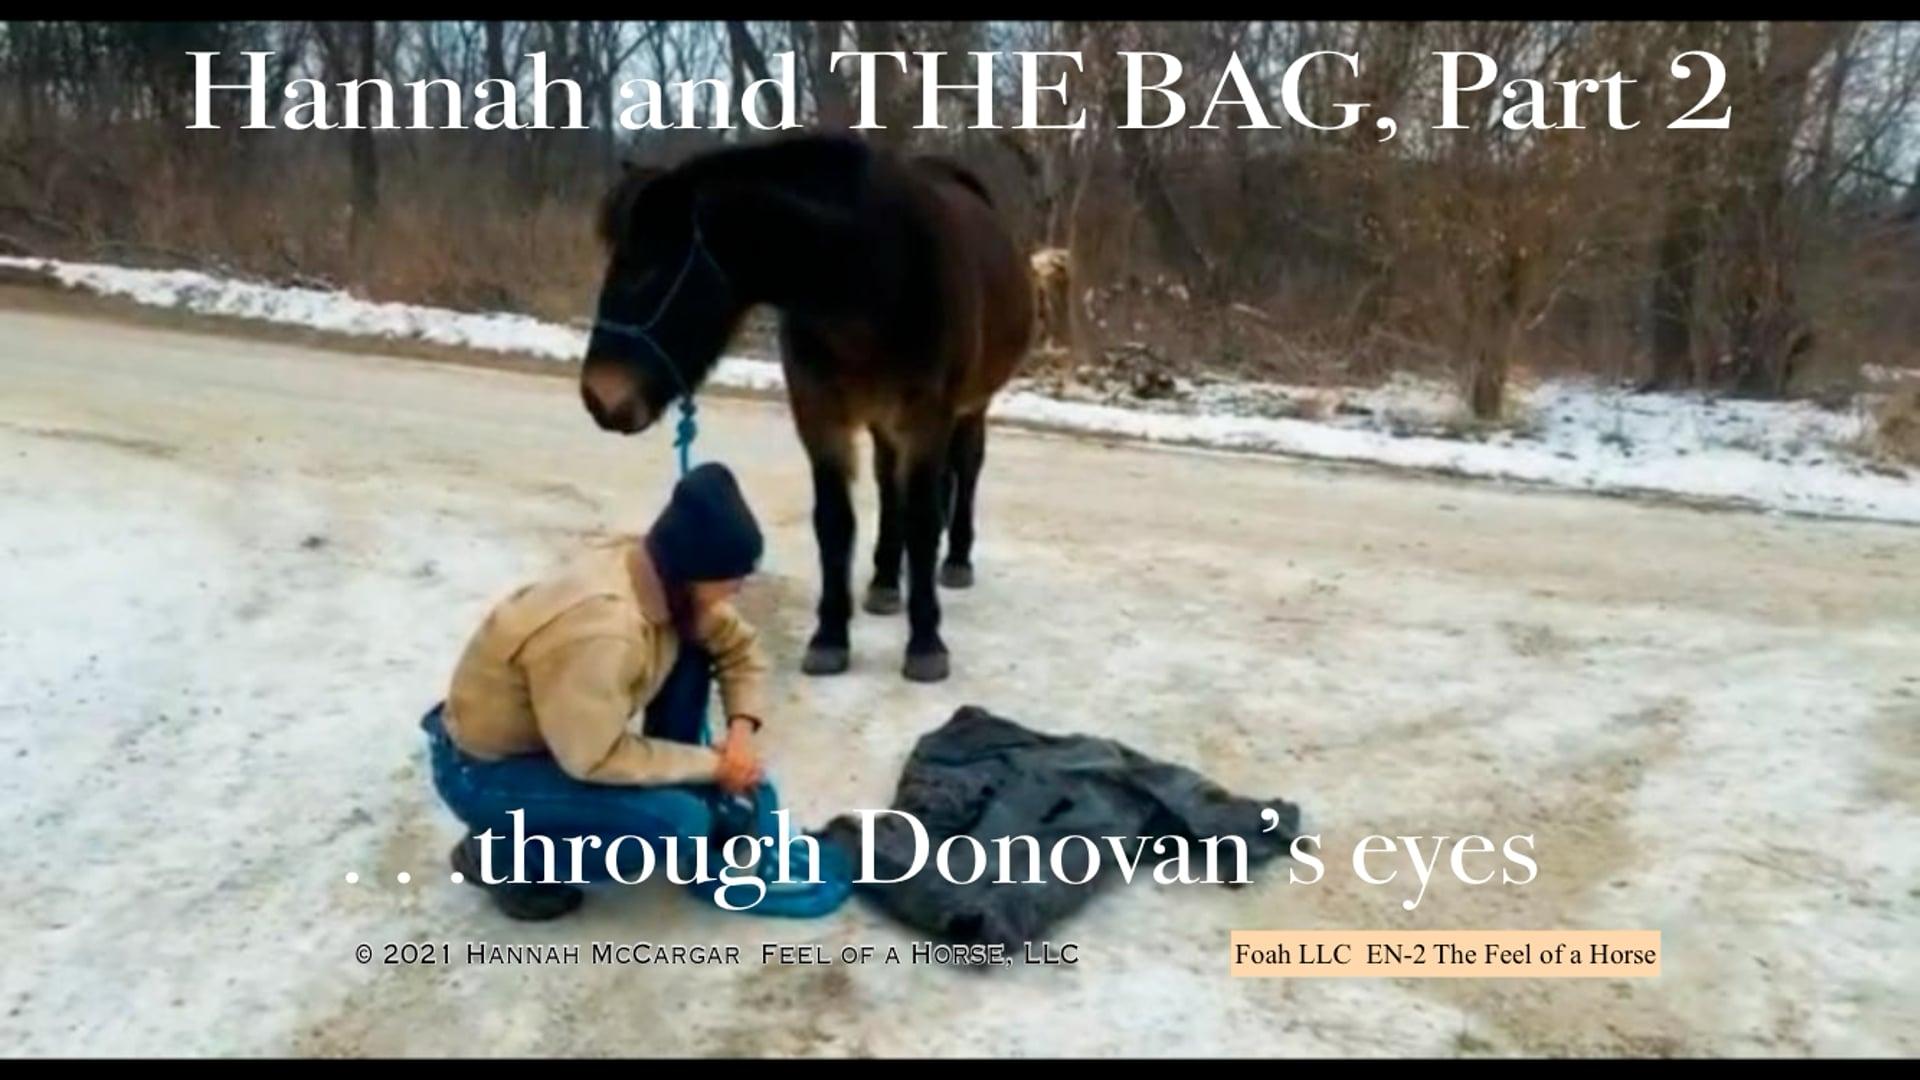 EN-2 Hannah & THE BAG, Part 2